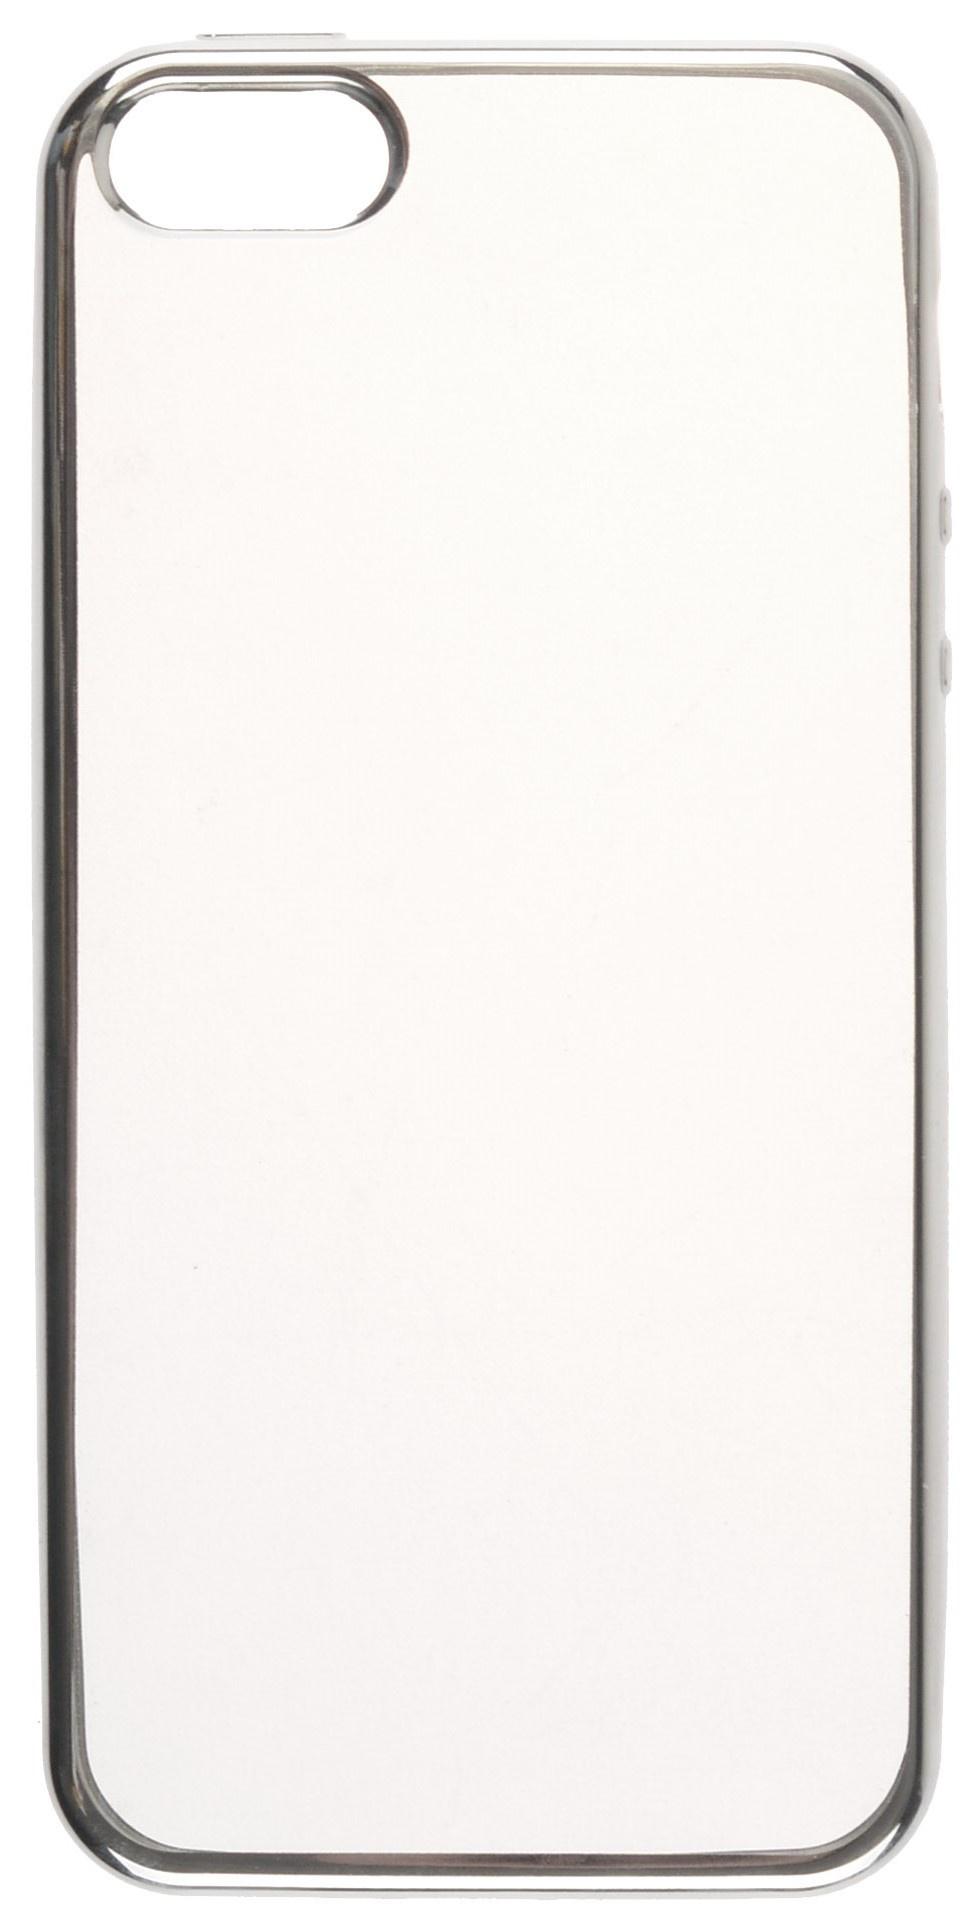 Чехол для сотового телефона skinBOX Silicone chrome border, 4660041407655, серебристый чехол для сотового телефона skinbox silicone chrome border 4630042524514 серебристый